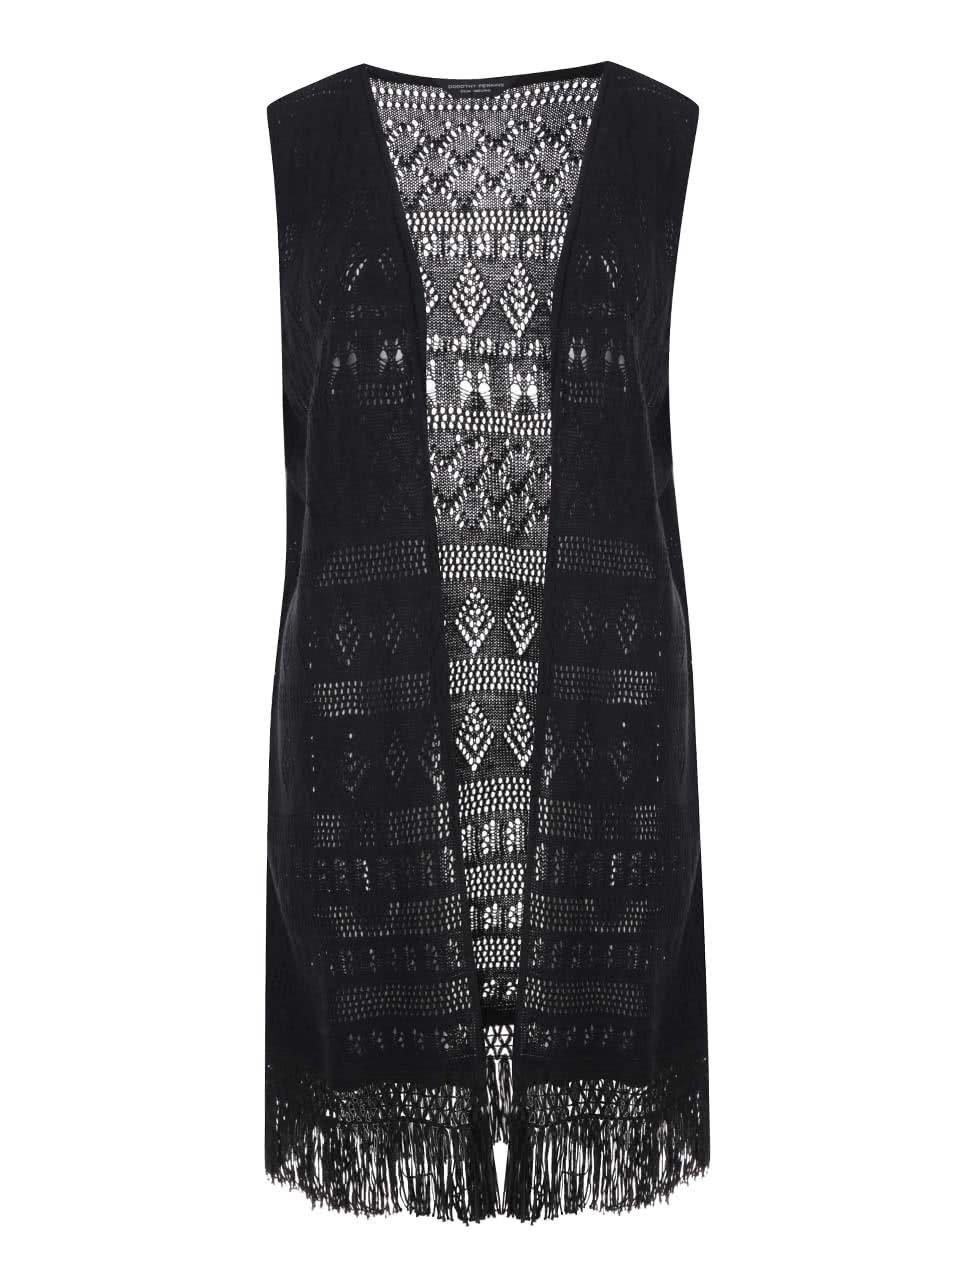 5c2483d5457b Černá pletená vesta s třásněmi Dorothy Perkins Curve ...